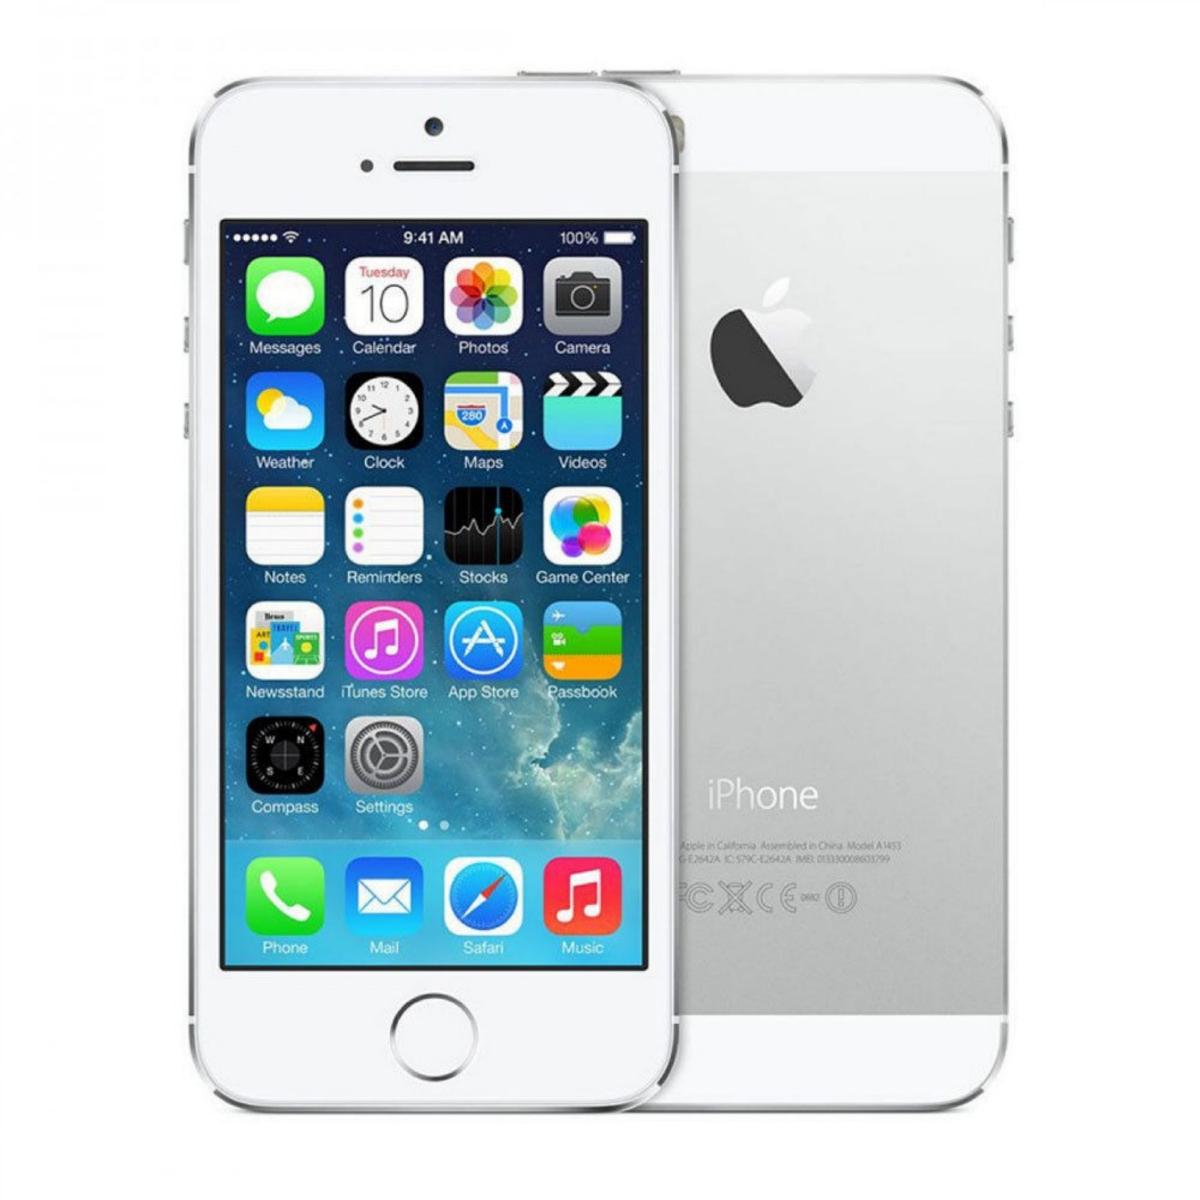 Apple-iPhone-5s-Unlocked-GSM-Unlocked-AT-amp-T-Verizon-T-Mobile-A1533 thumbnail 20